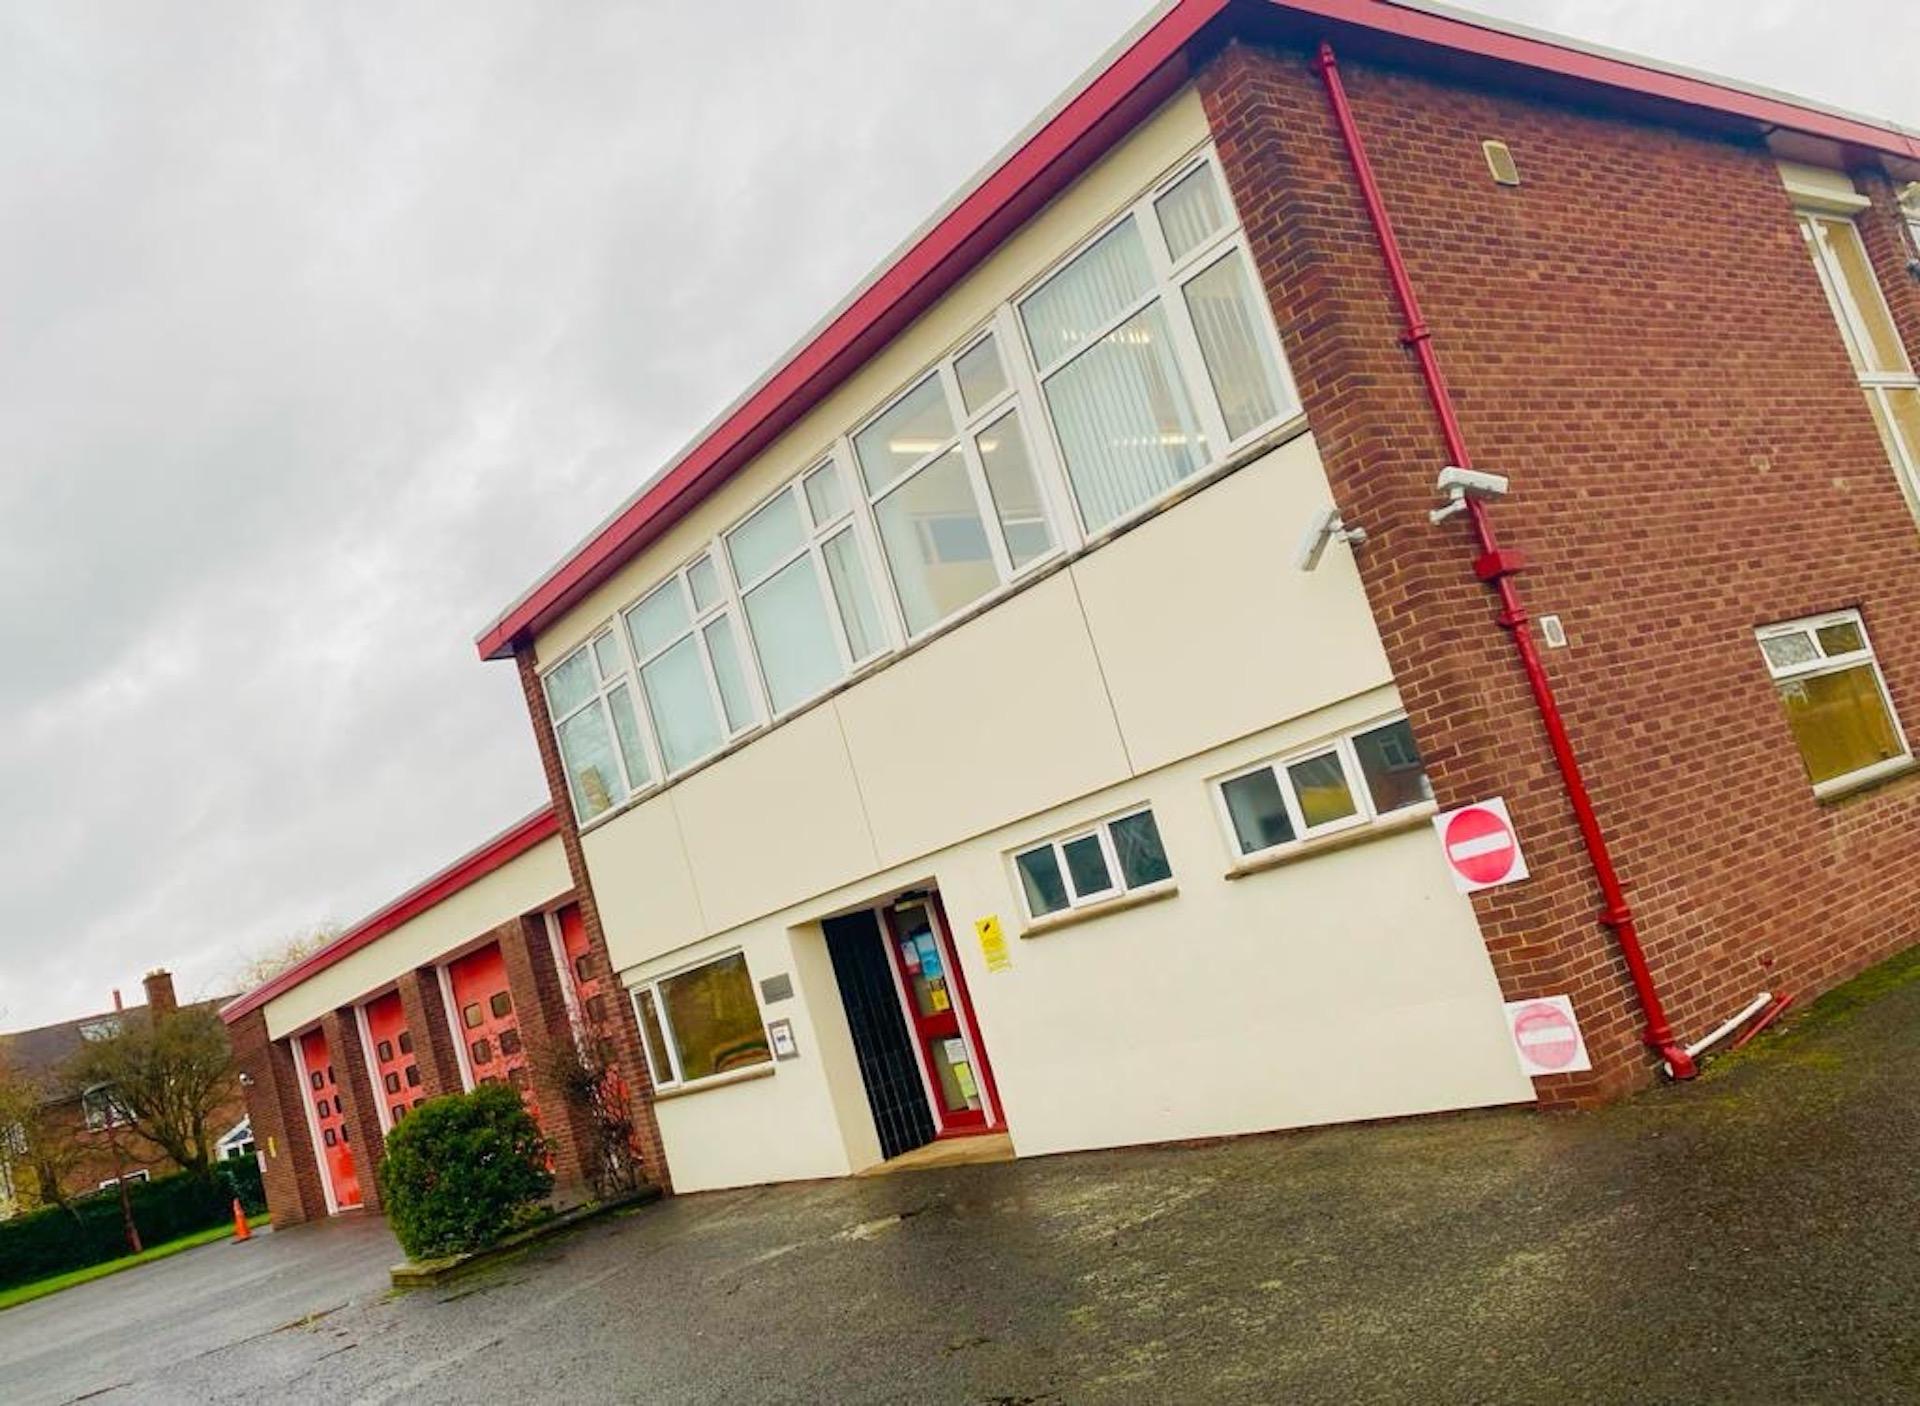 moortown fire station – phase ii – refurbishment works 2